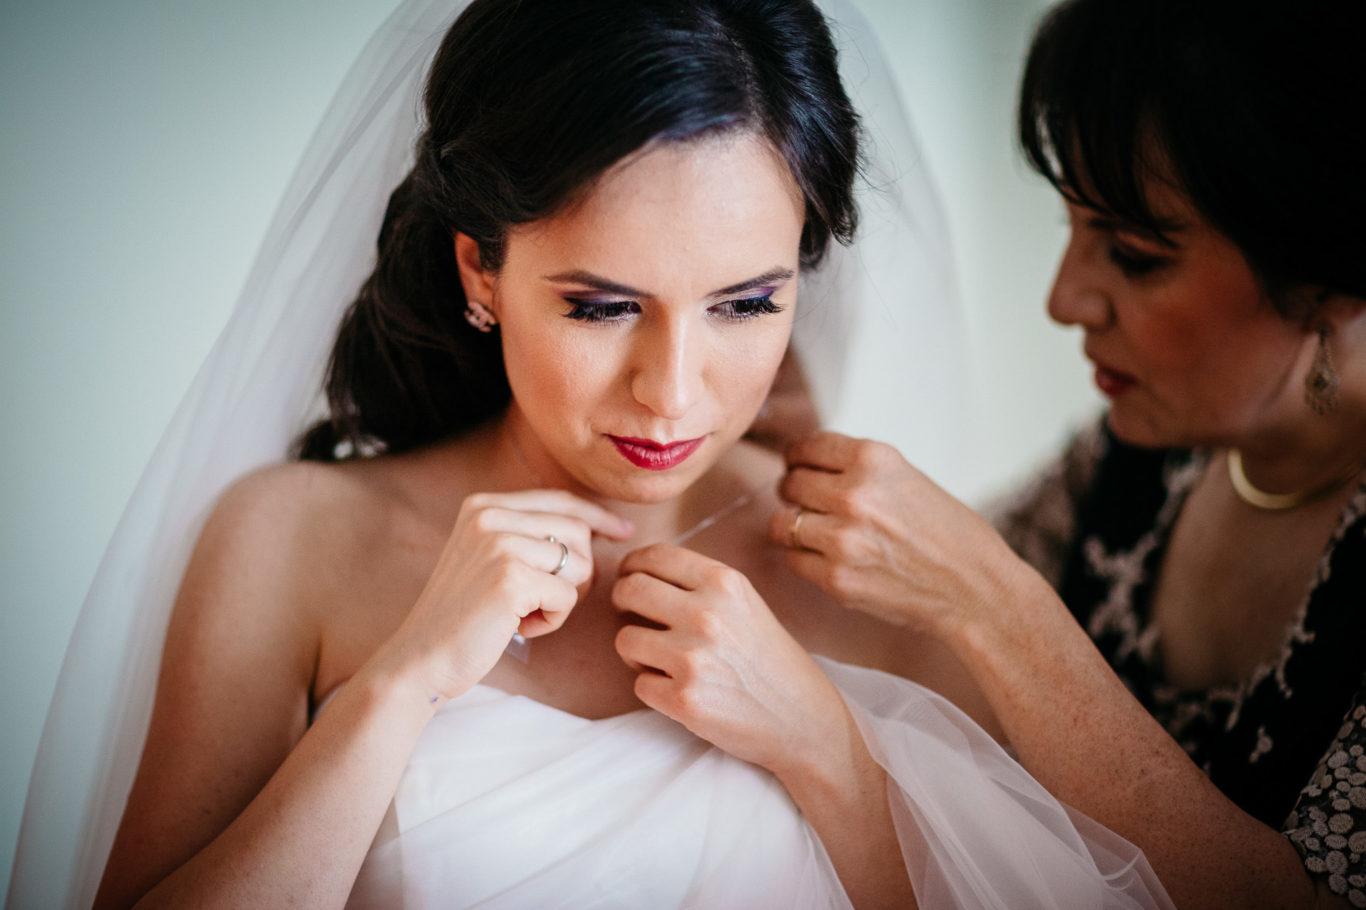 0180-Fotografie-nunta-Simona-Valentin-fotograf-Ciprian-Dumitrescu-CDF_8389